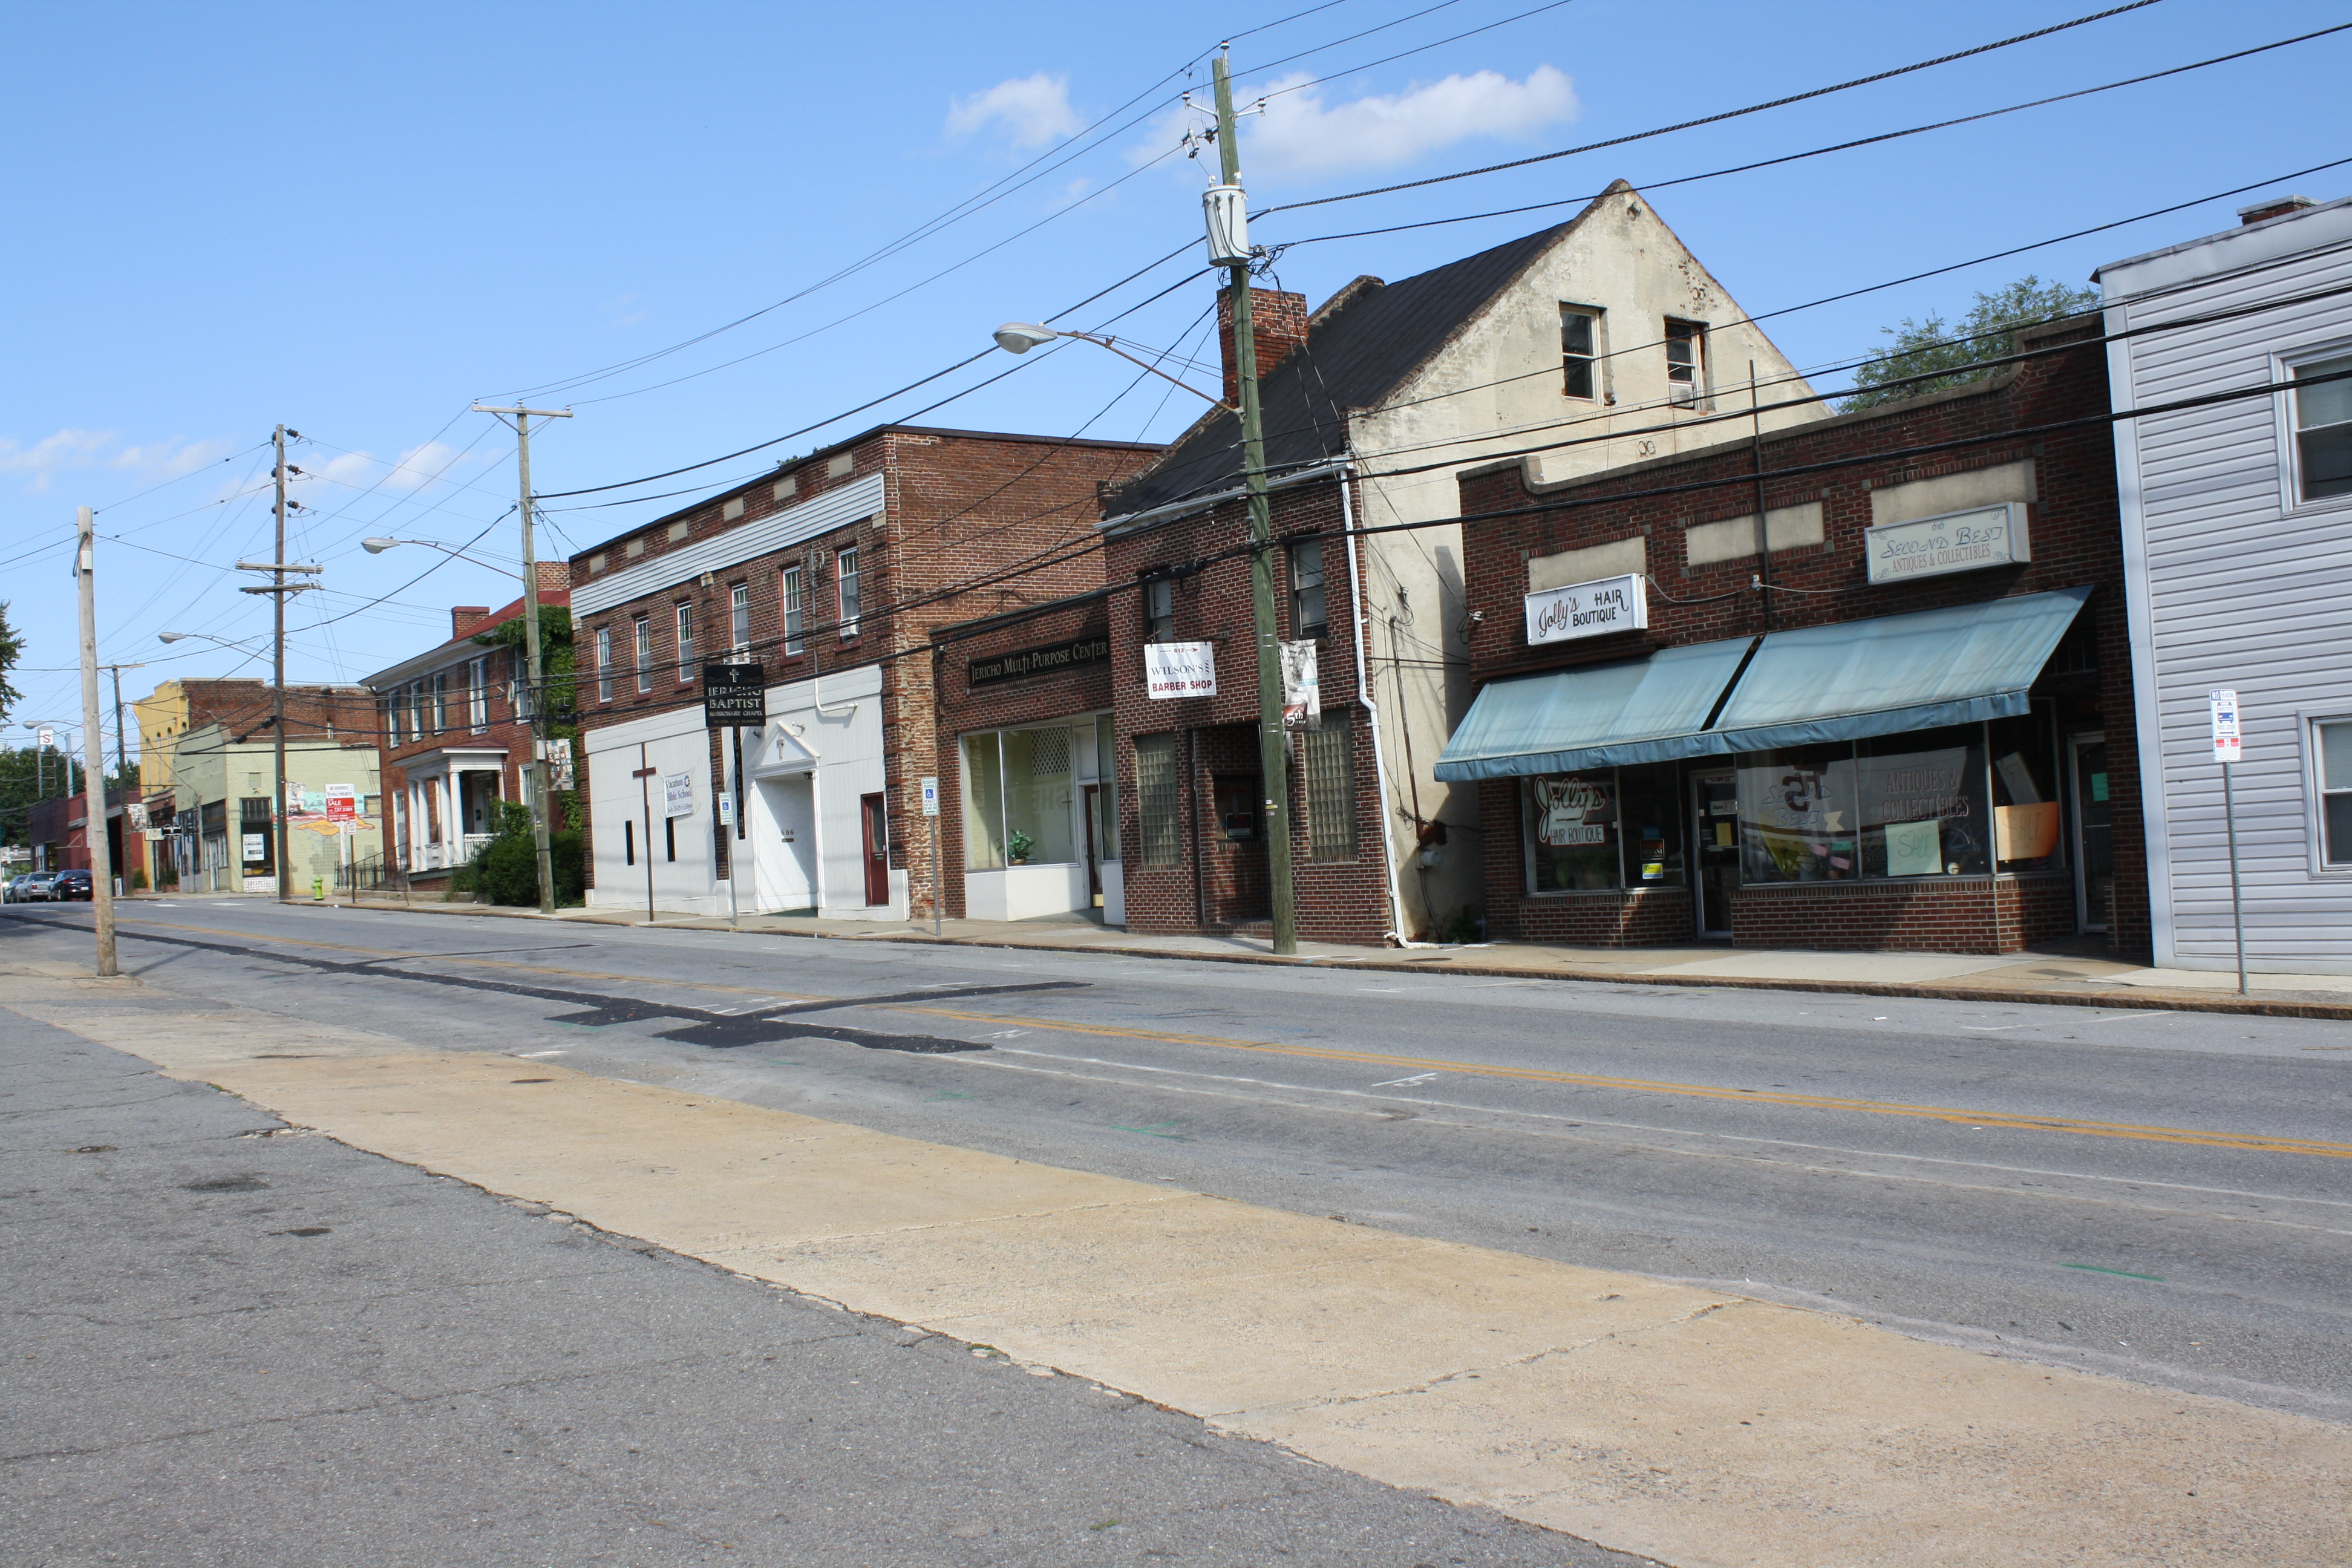 Lynchburg (VA) United States  city images : Street Historic District, Lynchburg, Virginia, United States...